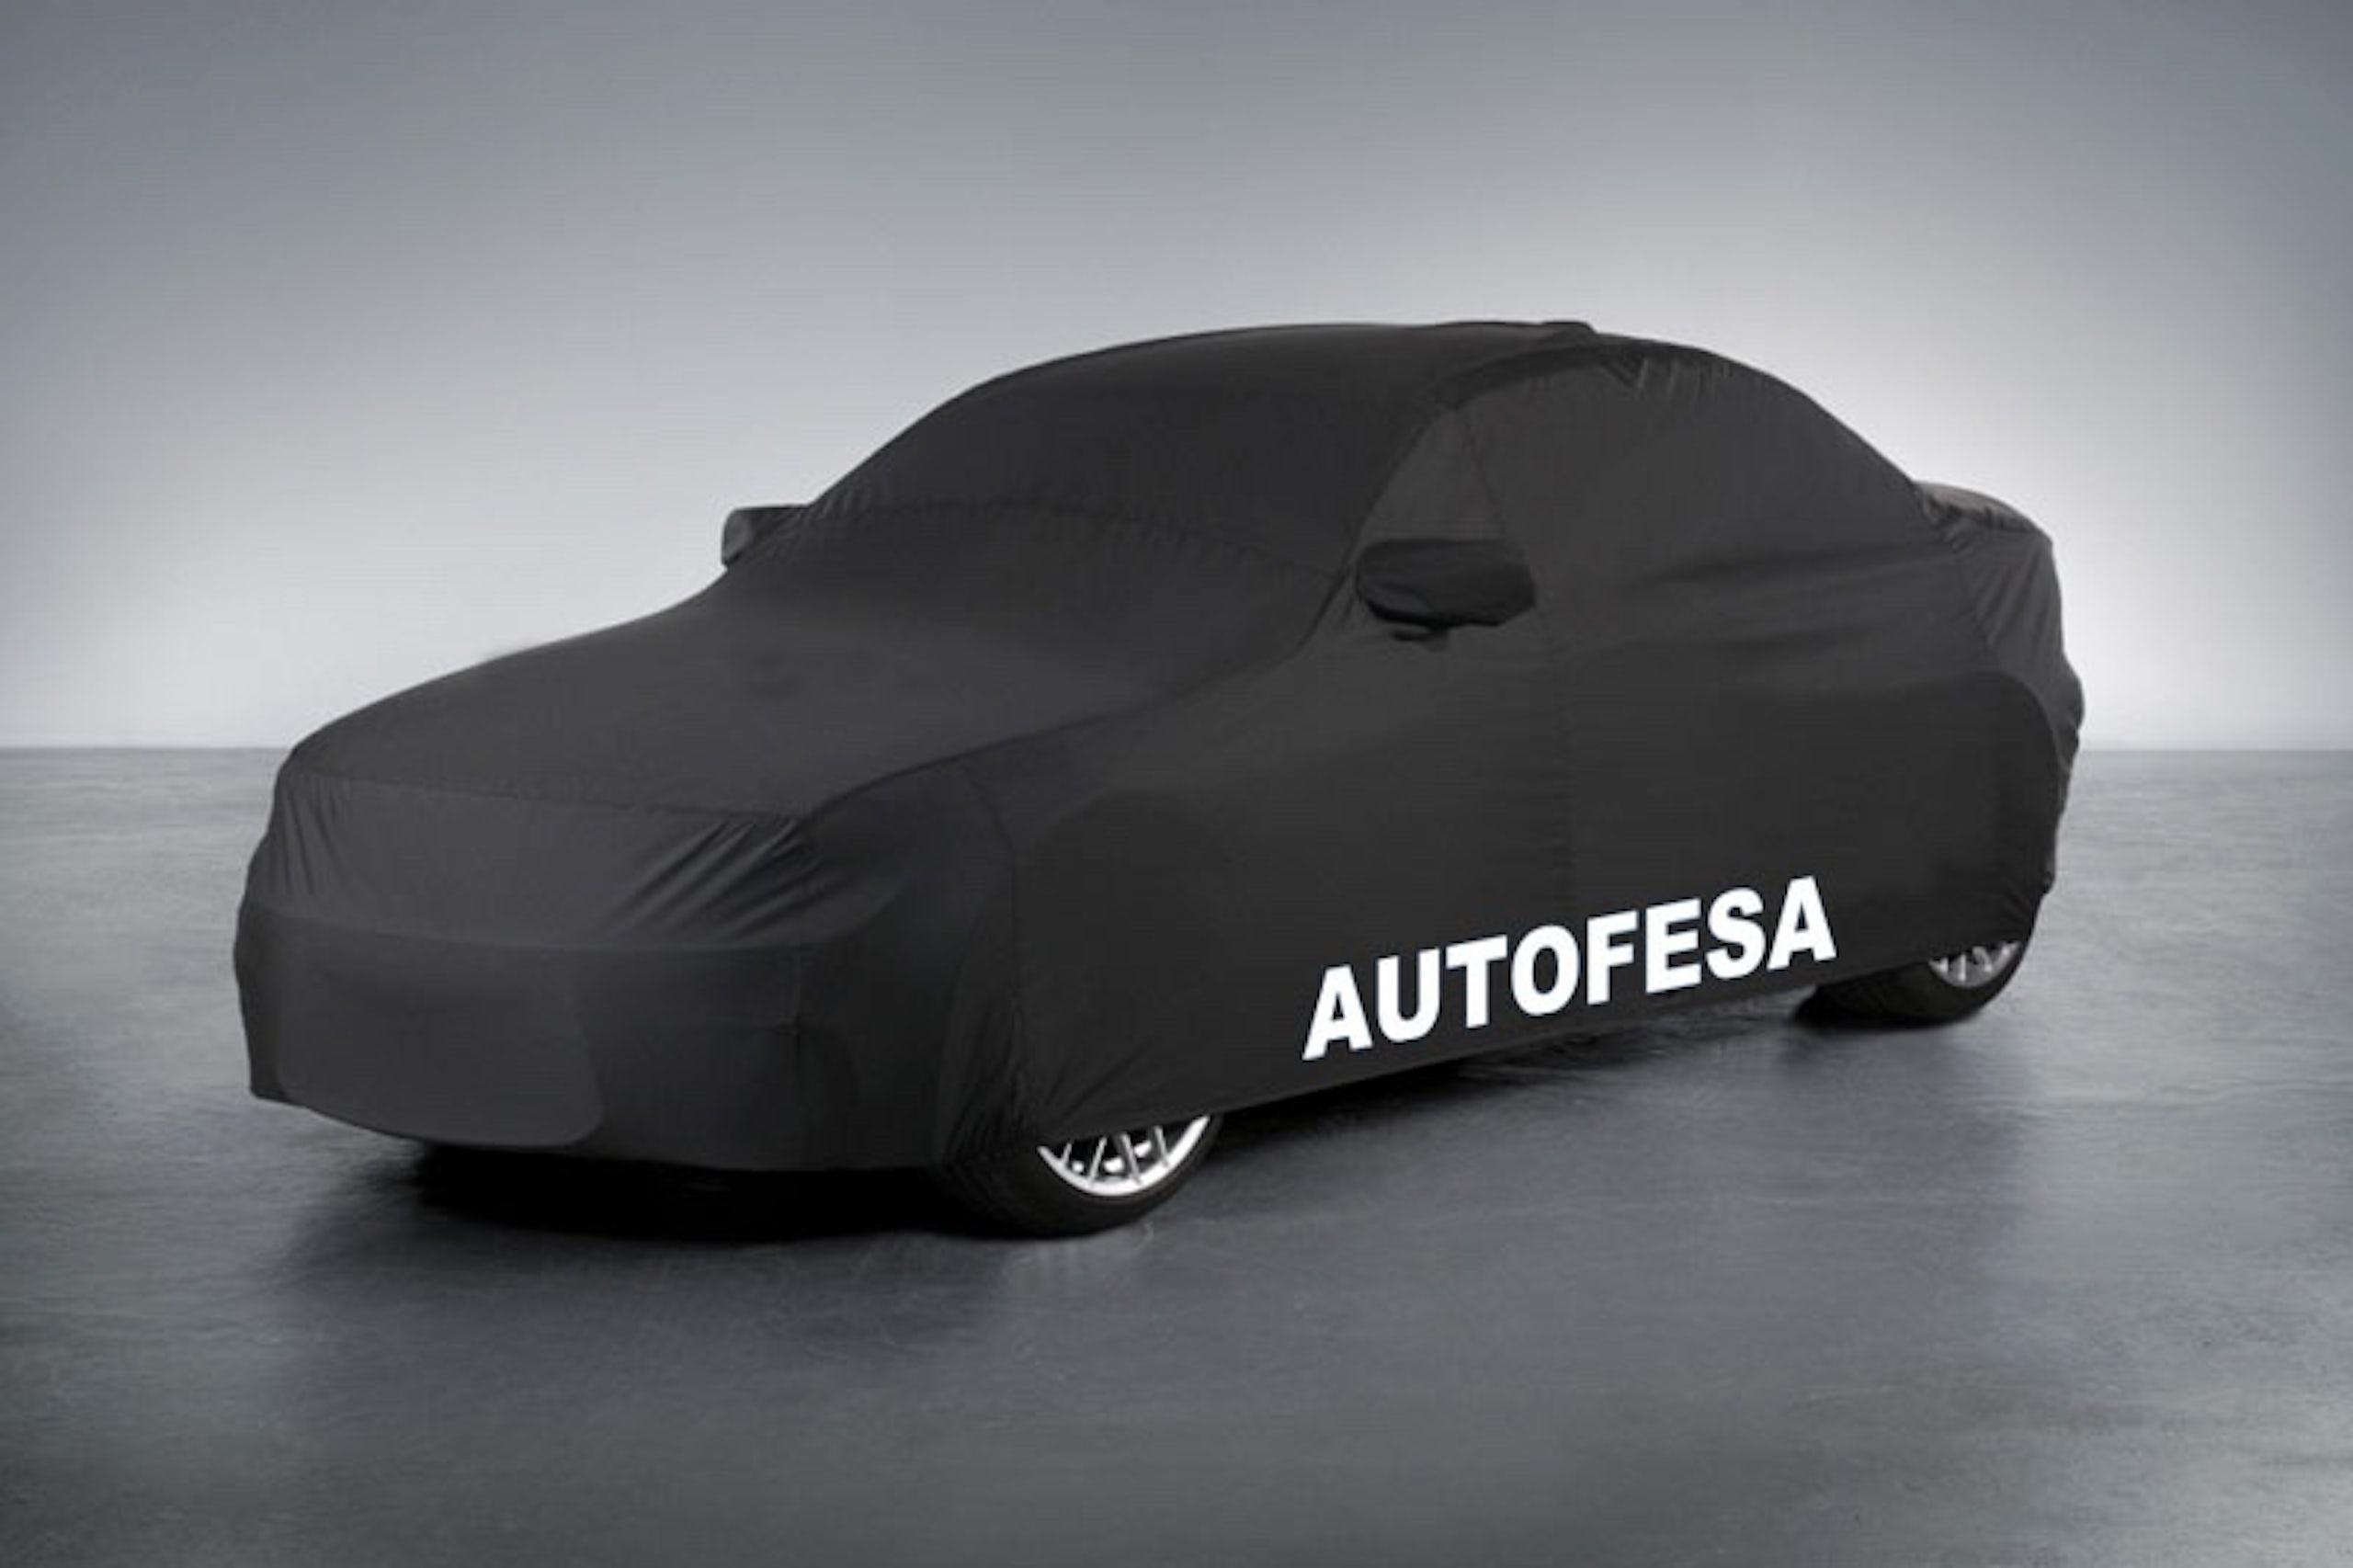 Audi A6 A6 3.0 TDI AVANT 204cv quattro 5p S tronic Auto S/S - Foto 7